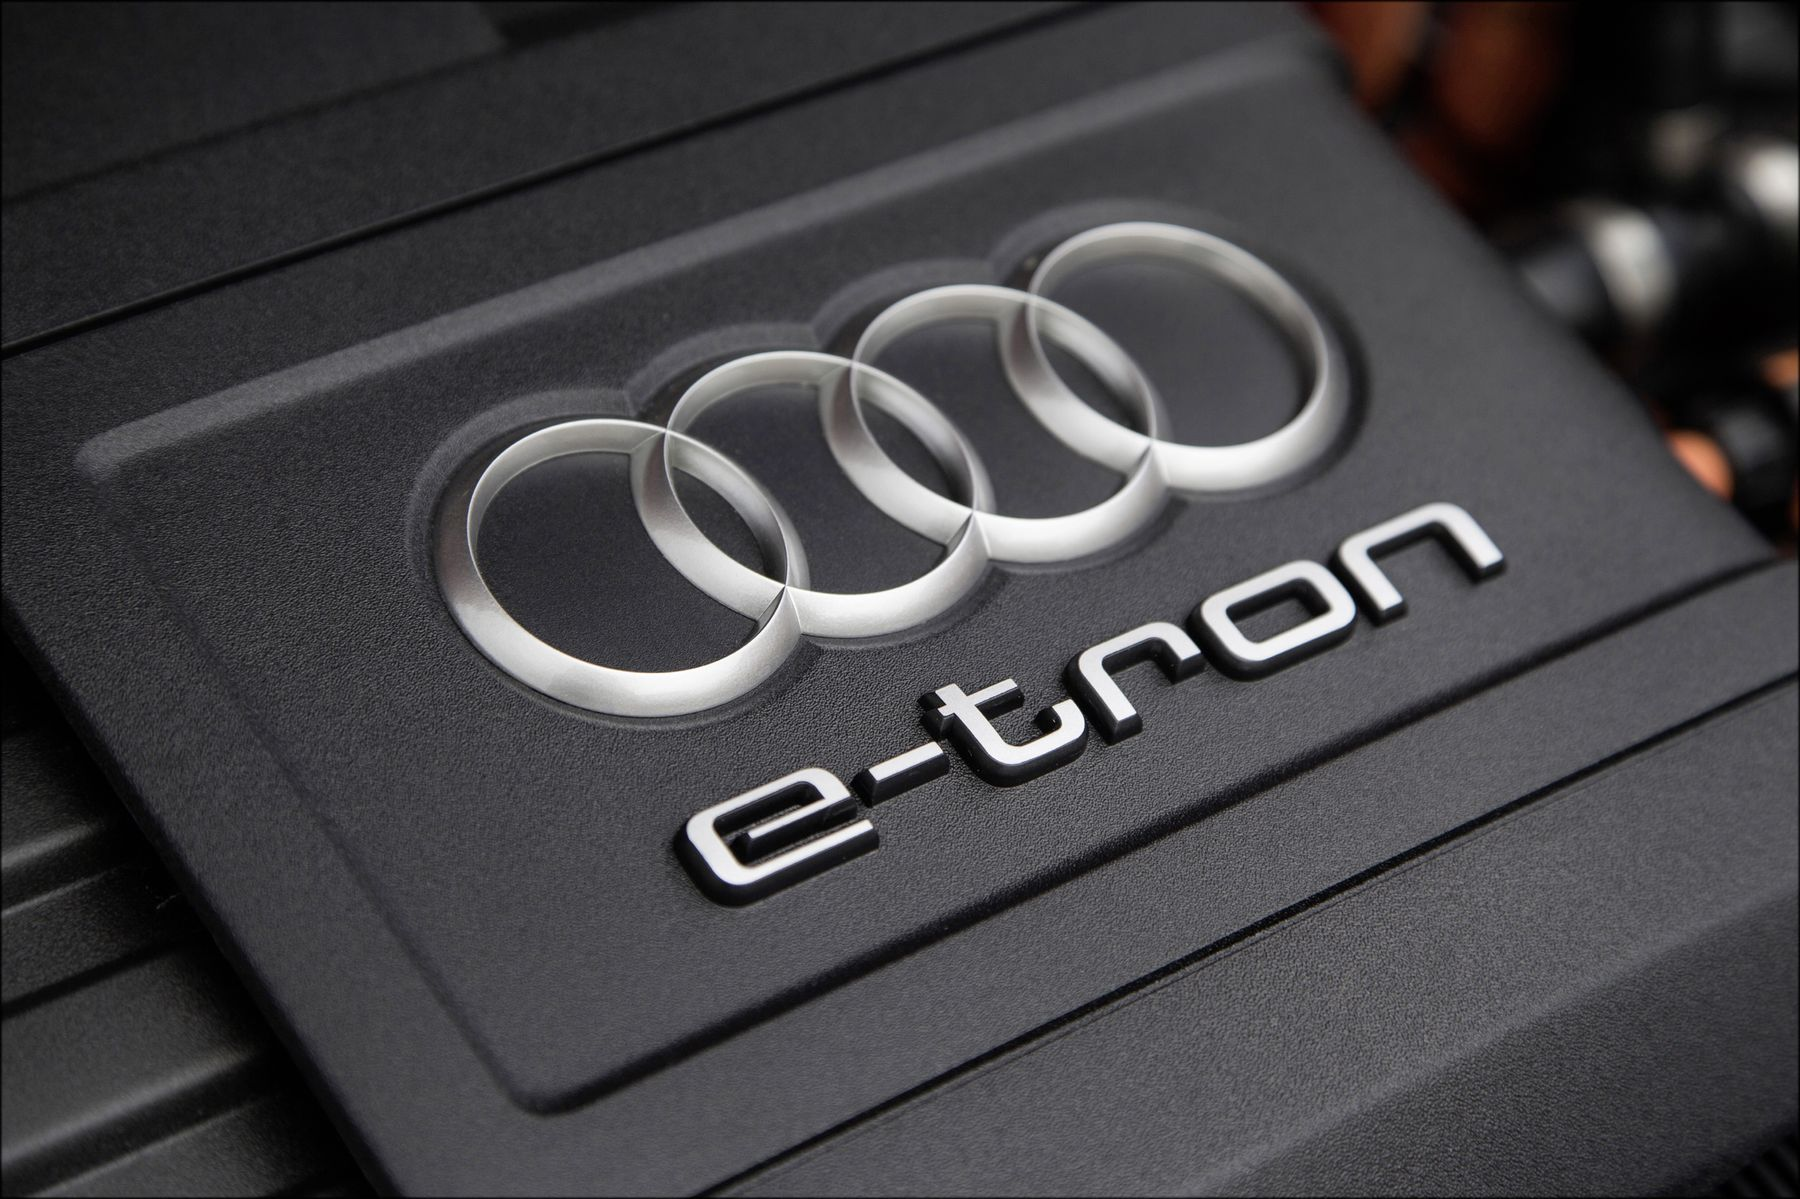 "Fahraufnahme    Farbe: Daytonagrau    <font size=""2""><b>Verbrauchsangaben Audi A3 Sportback e-tron:</b>Kraftstoffverbrauch kombiniert in l/100 km: 1,5;CO<sub>2</sub>-Emission kombiniert in g/km: 35</font>"